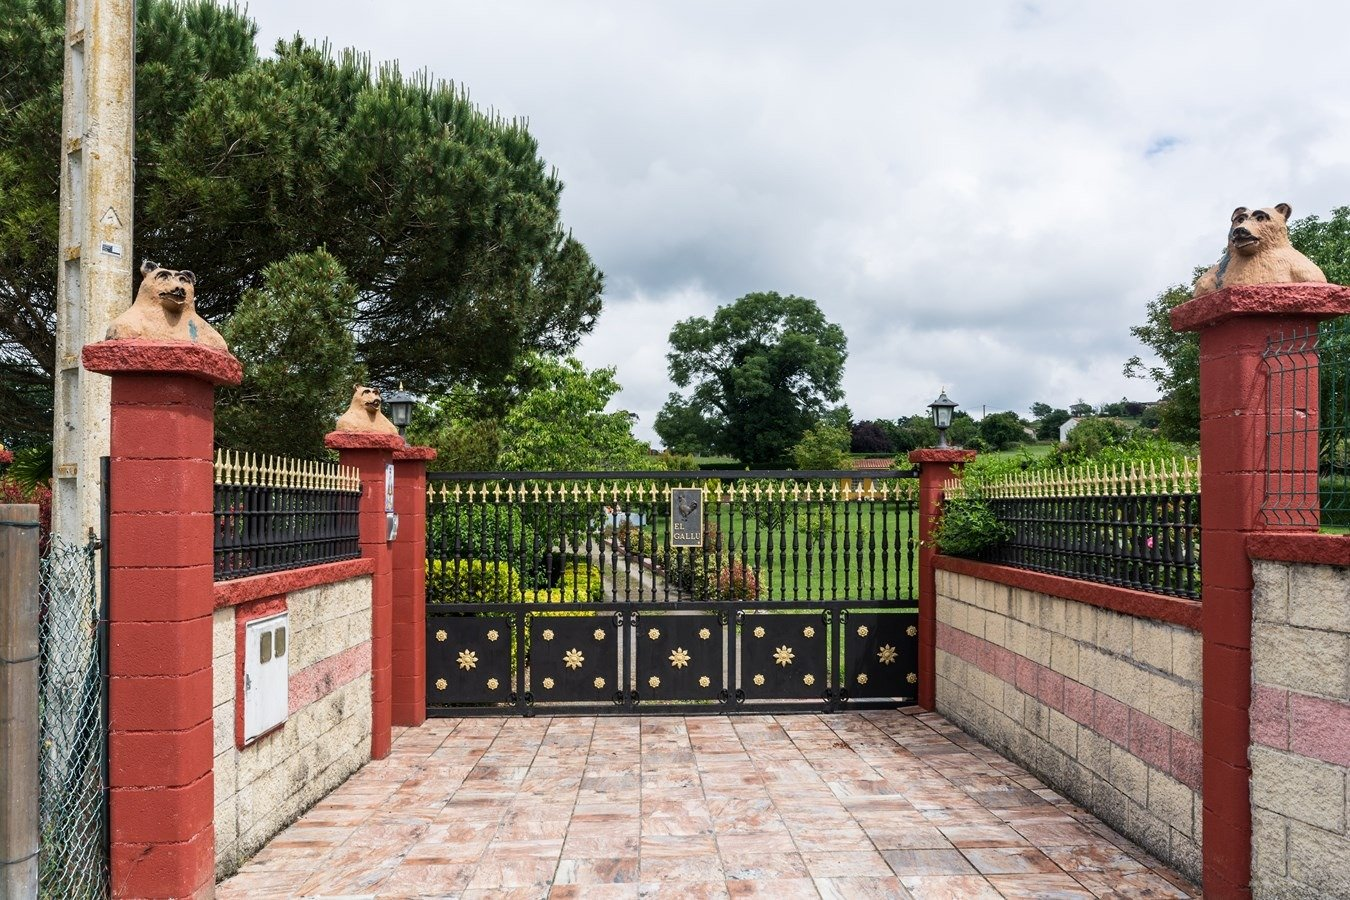 Maravillosa propiedad en orviz. siero - imagenInmueble2